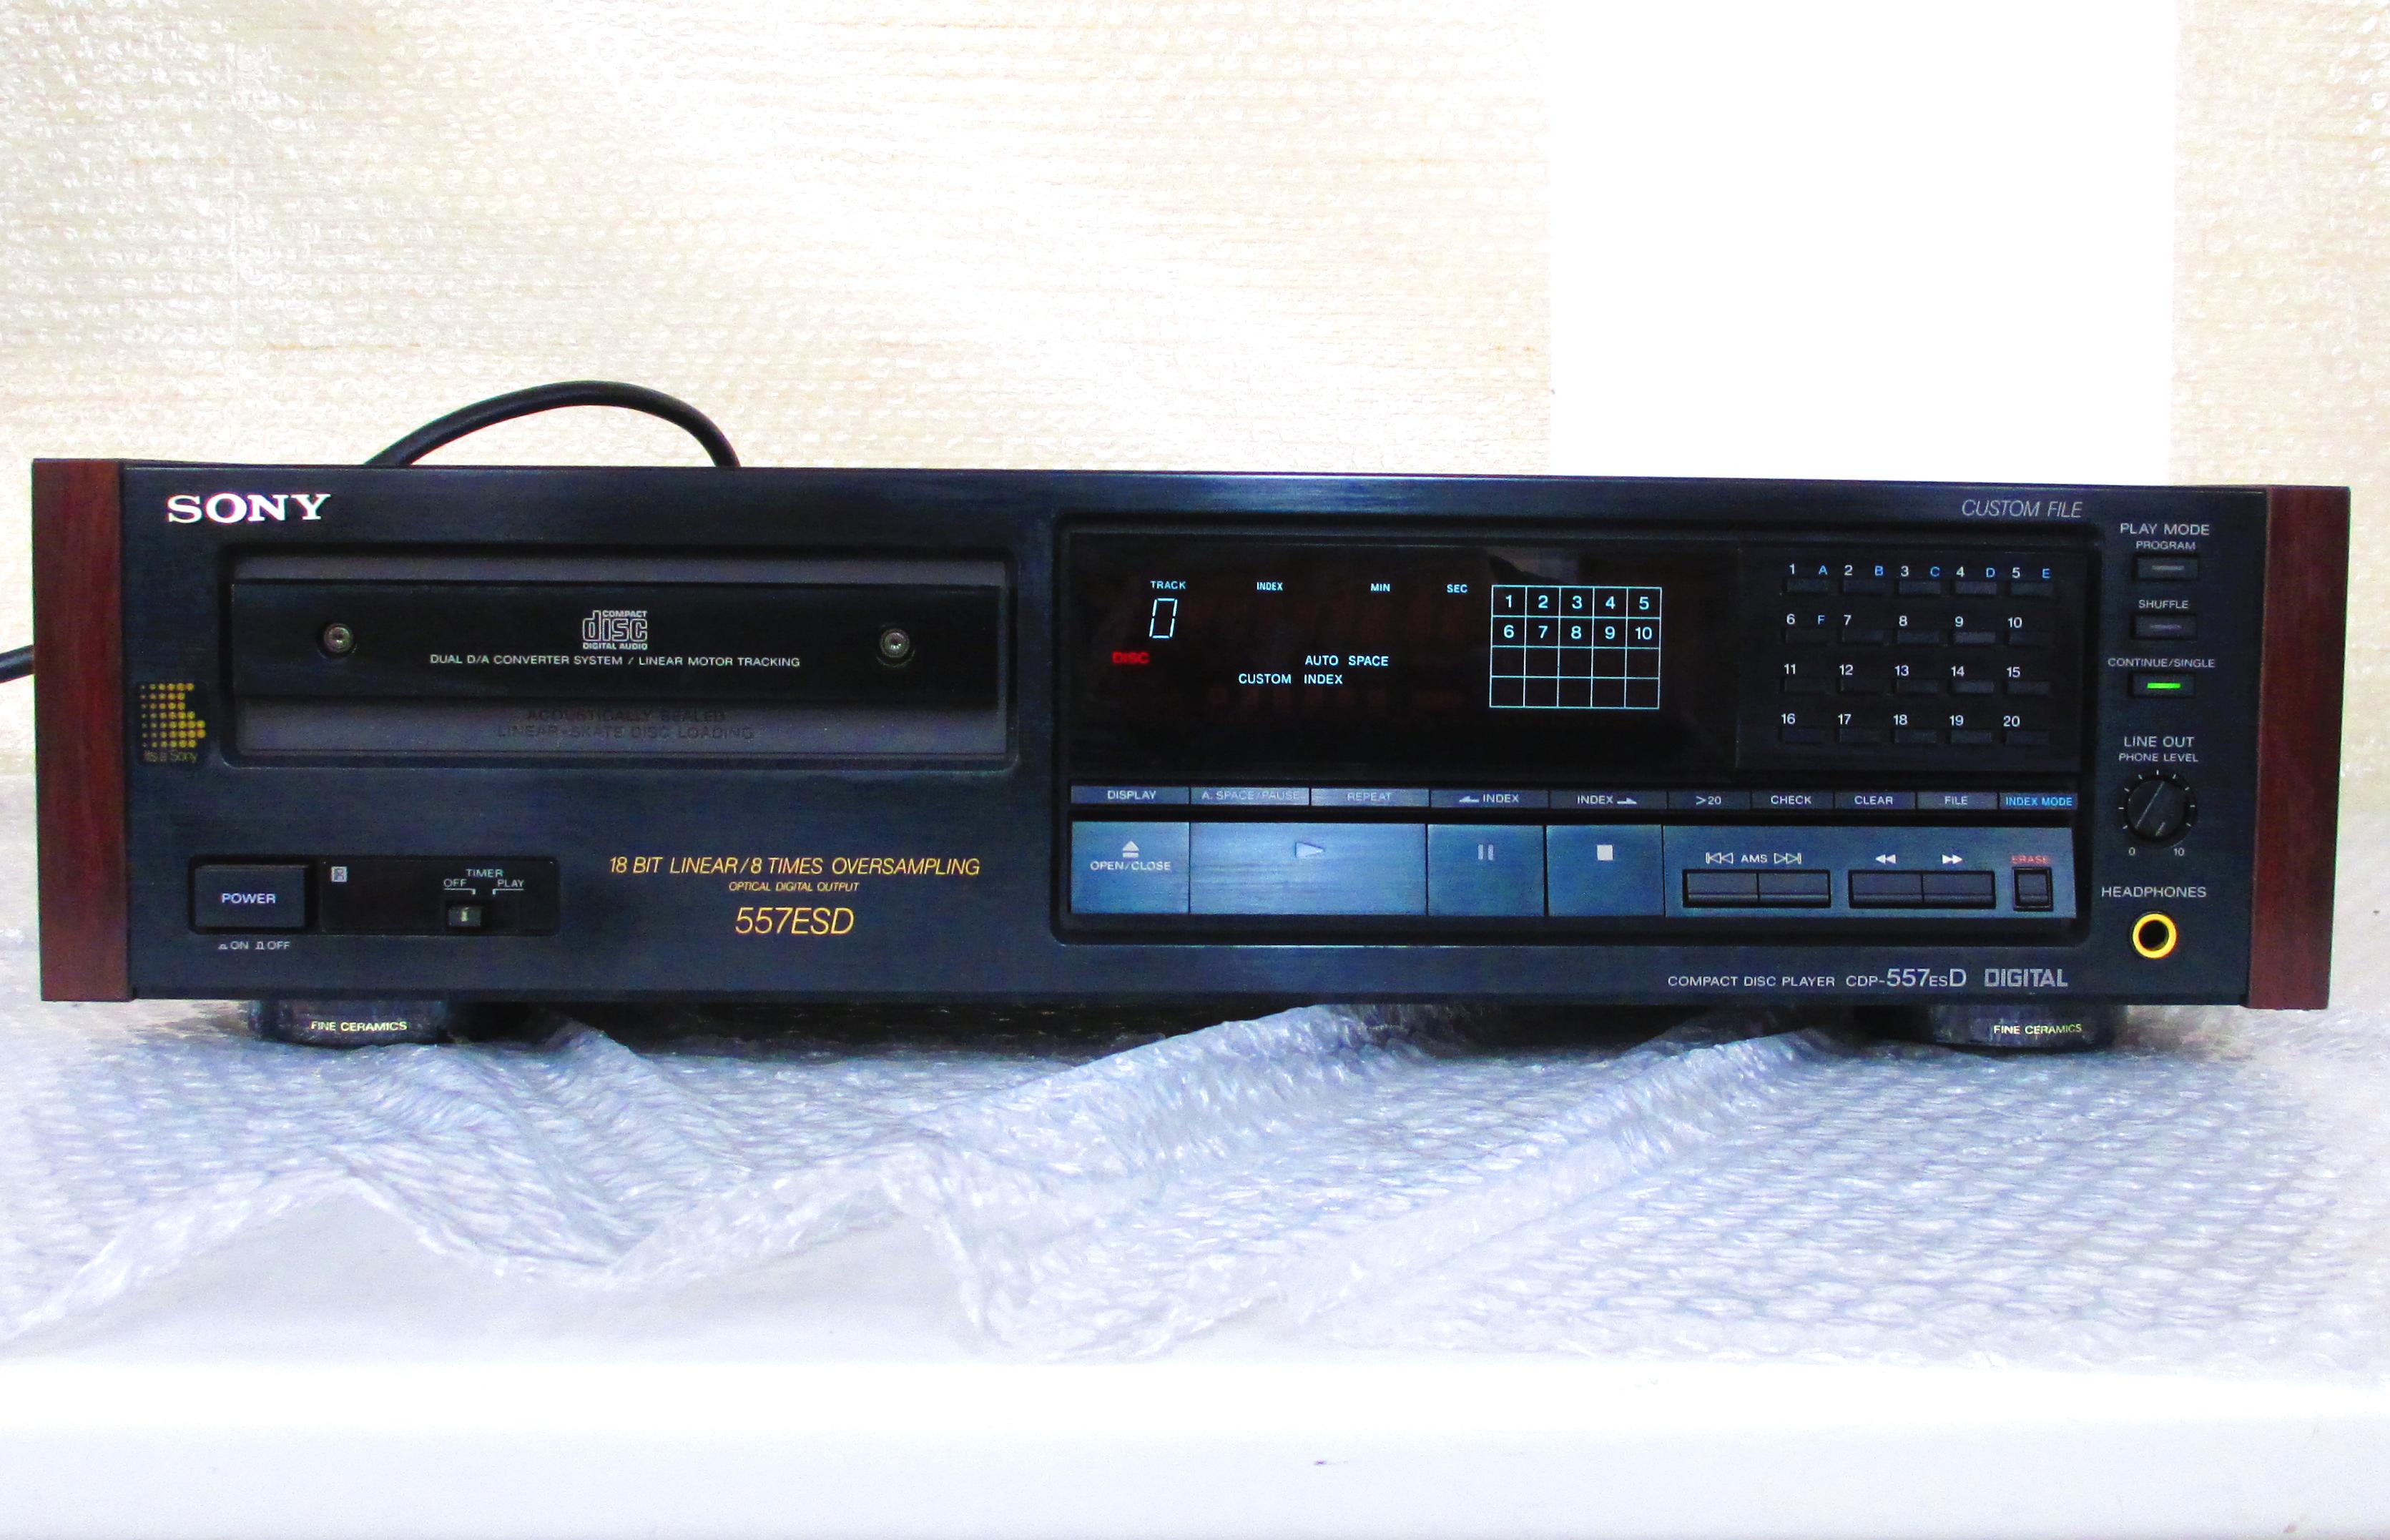 SONY CDP-557ESD CDプレイヤーを買取させて頂きました!